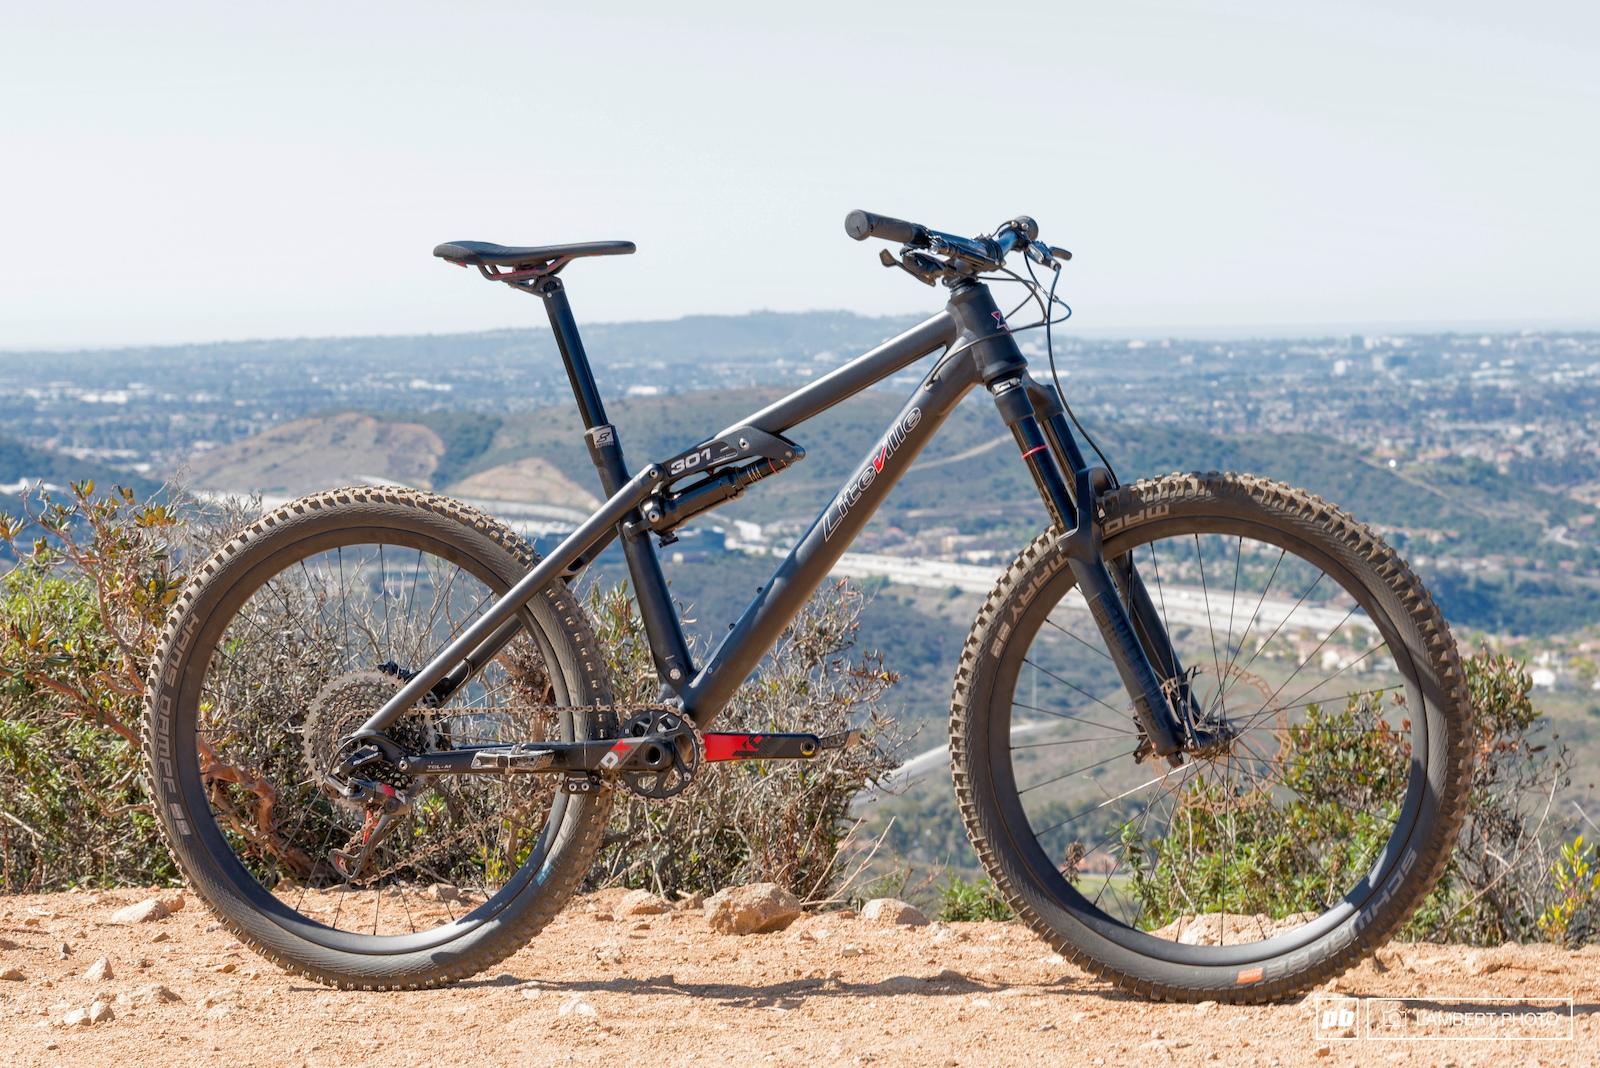 a43406c4823 Liteville 301 MK14 Enduro Factory Machine - Review - Pinkbike